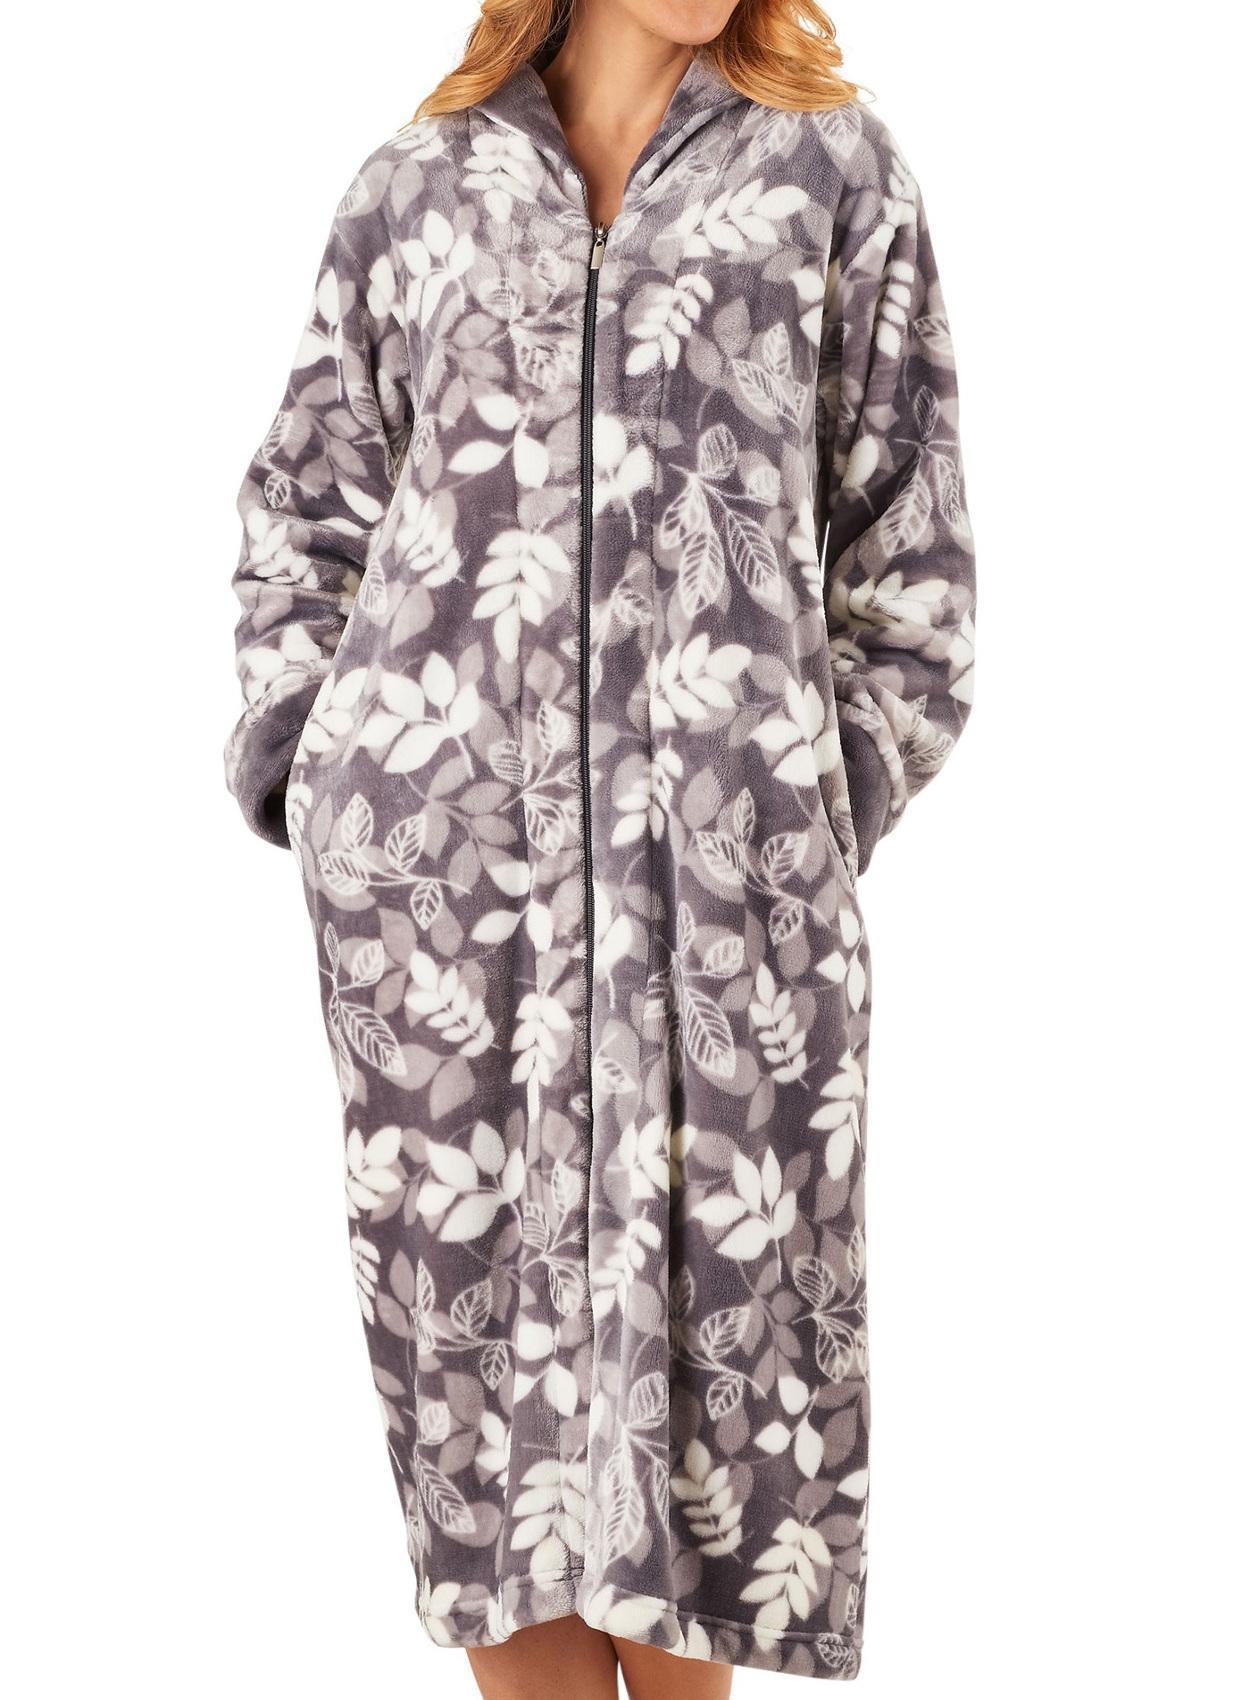 Dressing Gown Womens Leaf Pattern Zip Up Bathrobe Slenderella